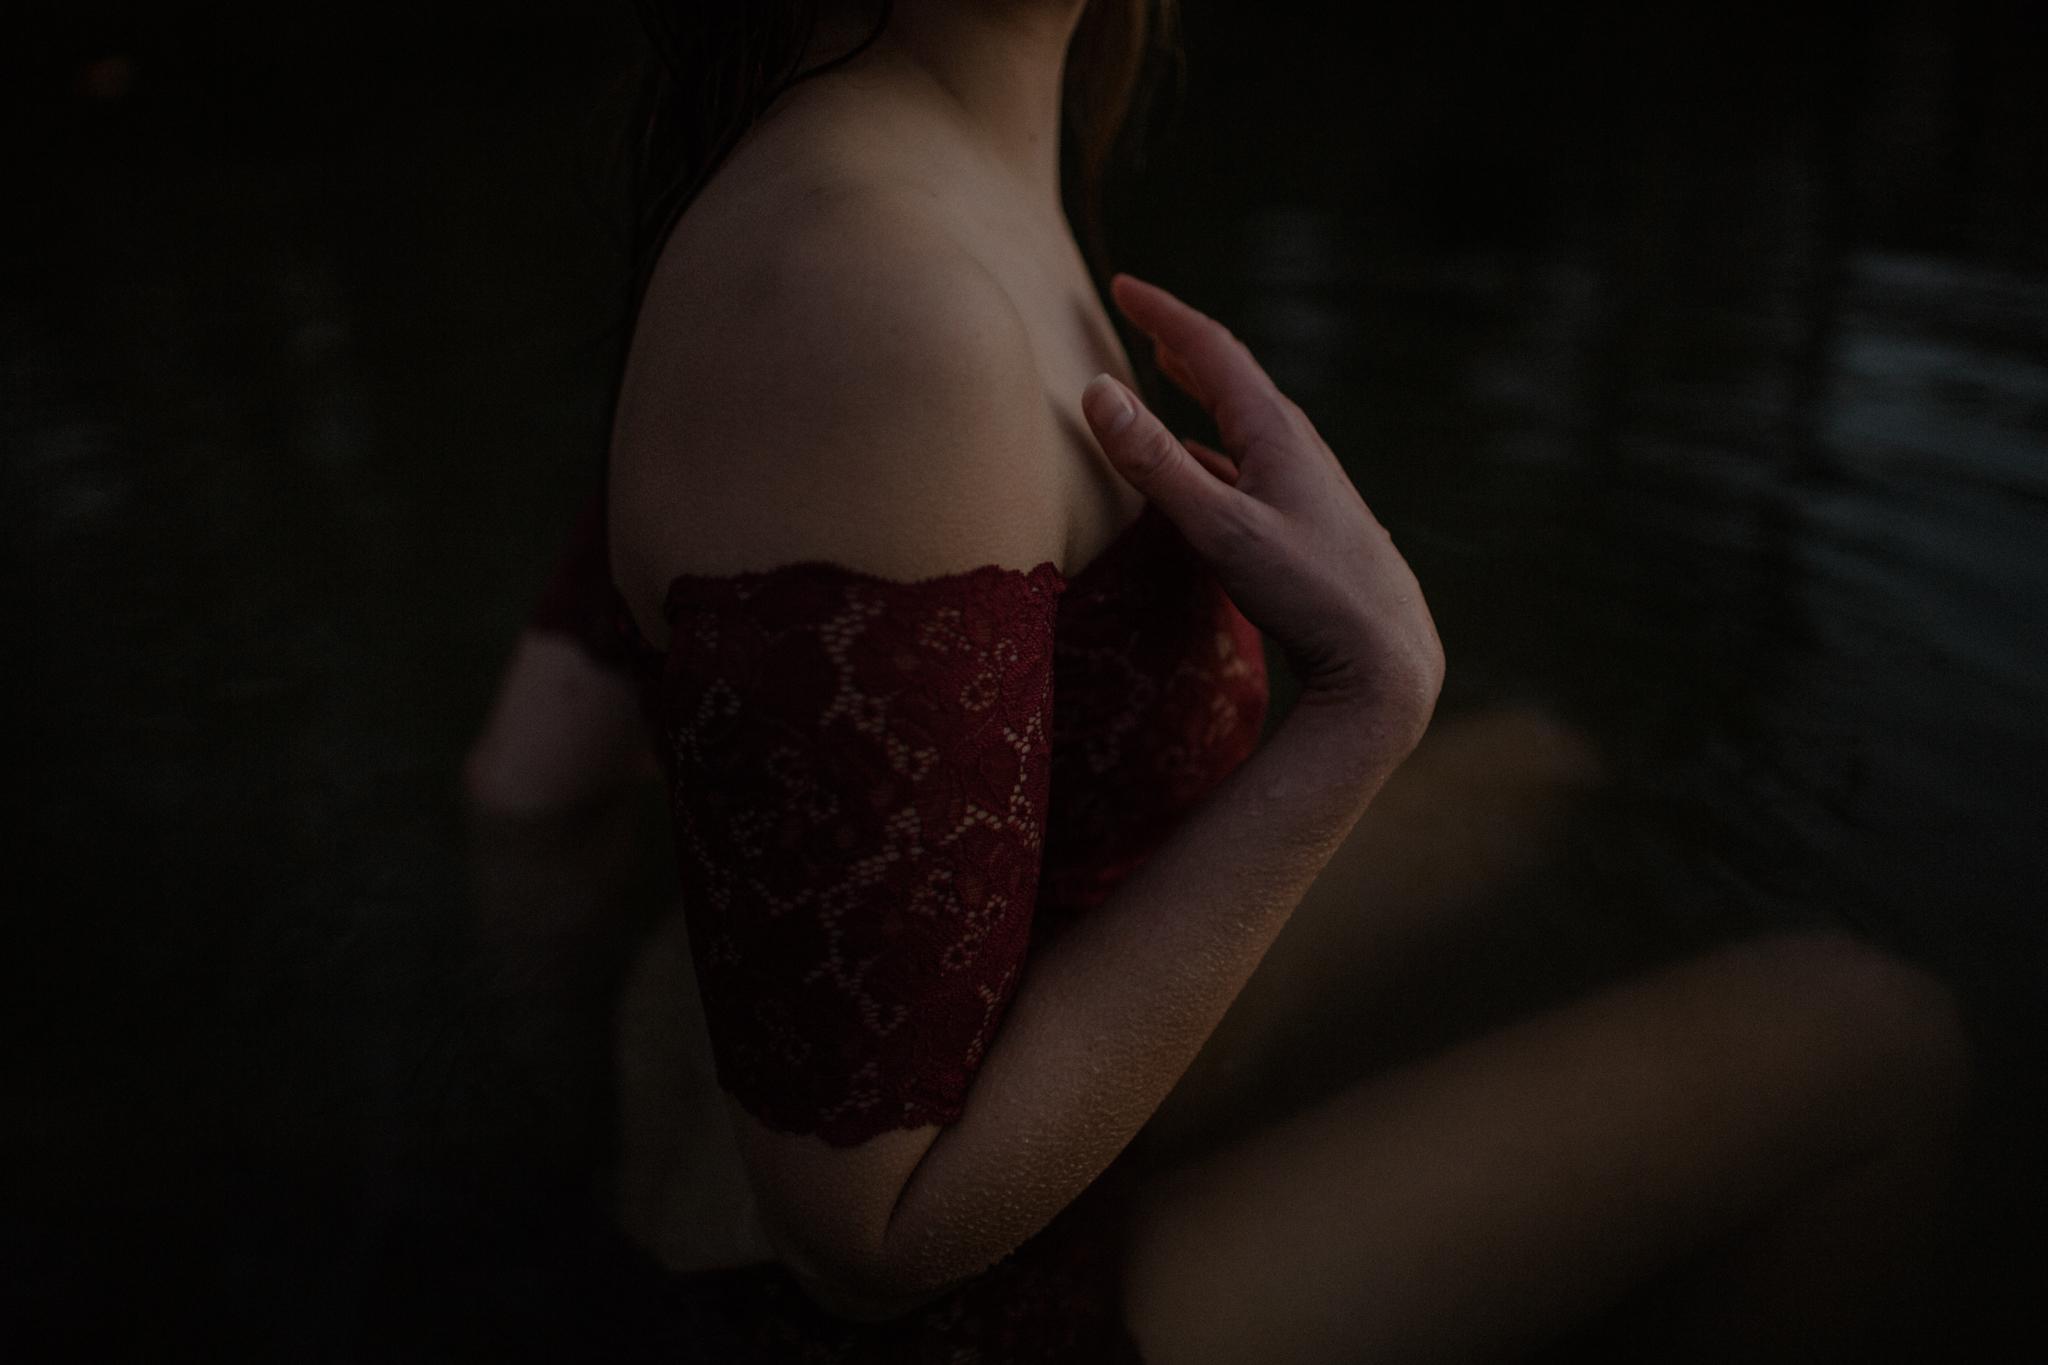 rachael schmitt in nahina lingerie by sarah rose lingerie editorial photography